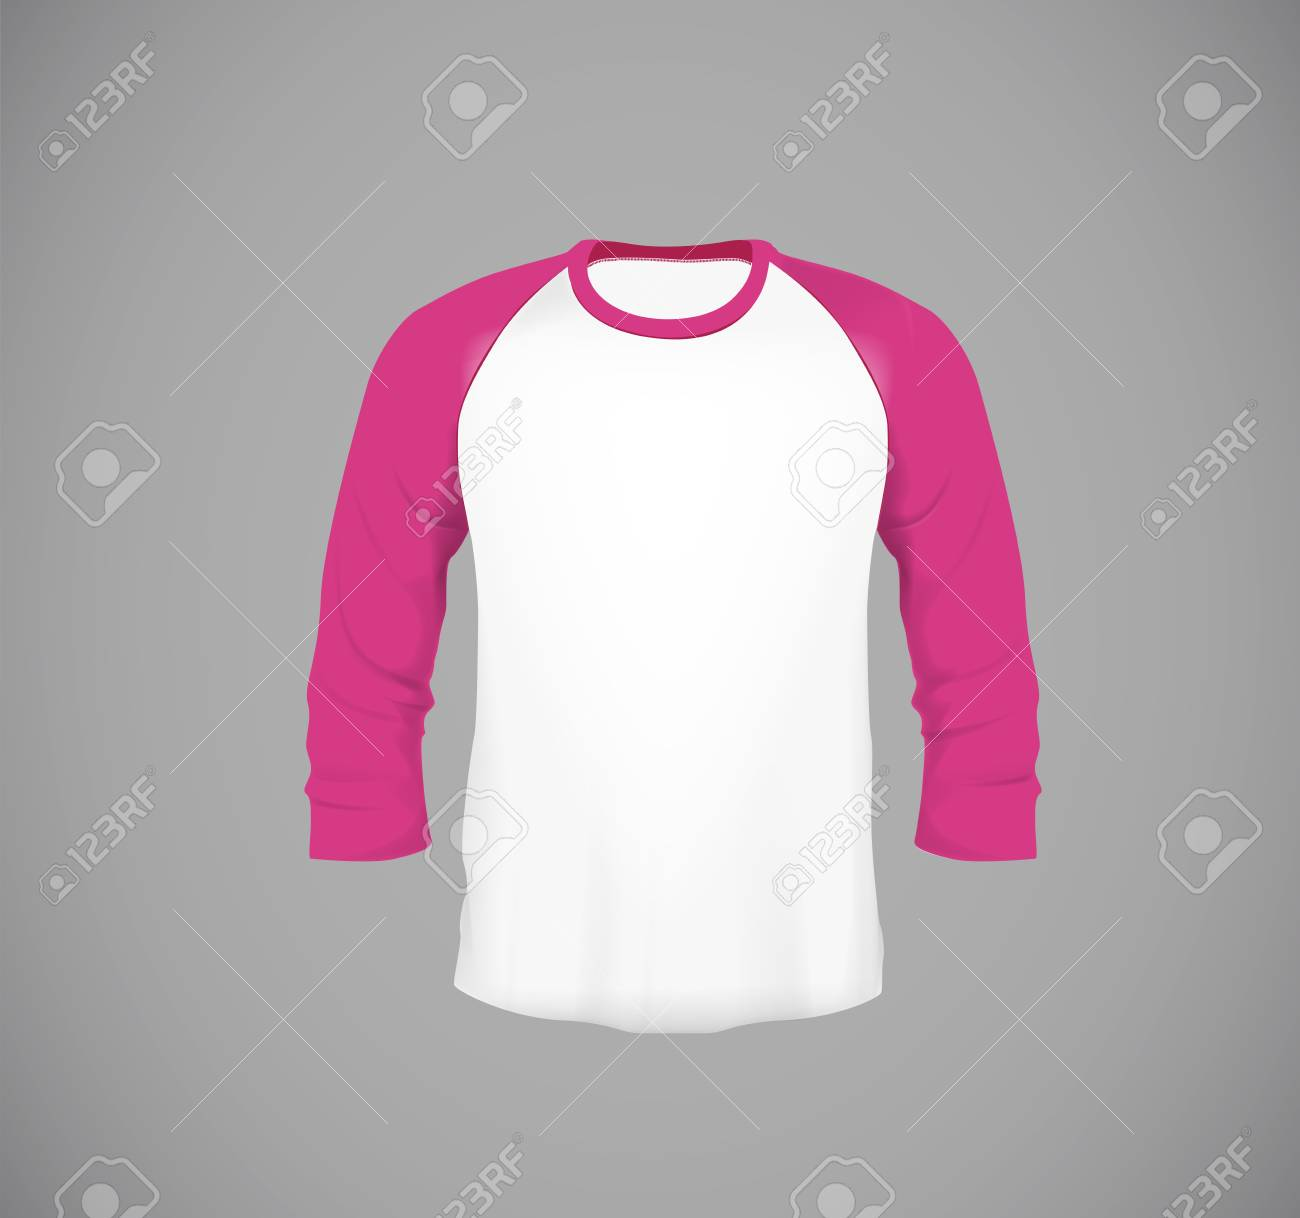 d7668d2f Men's slim-fitting long sleeve baseball shirt. Pink Mock-up design template  for